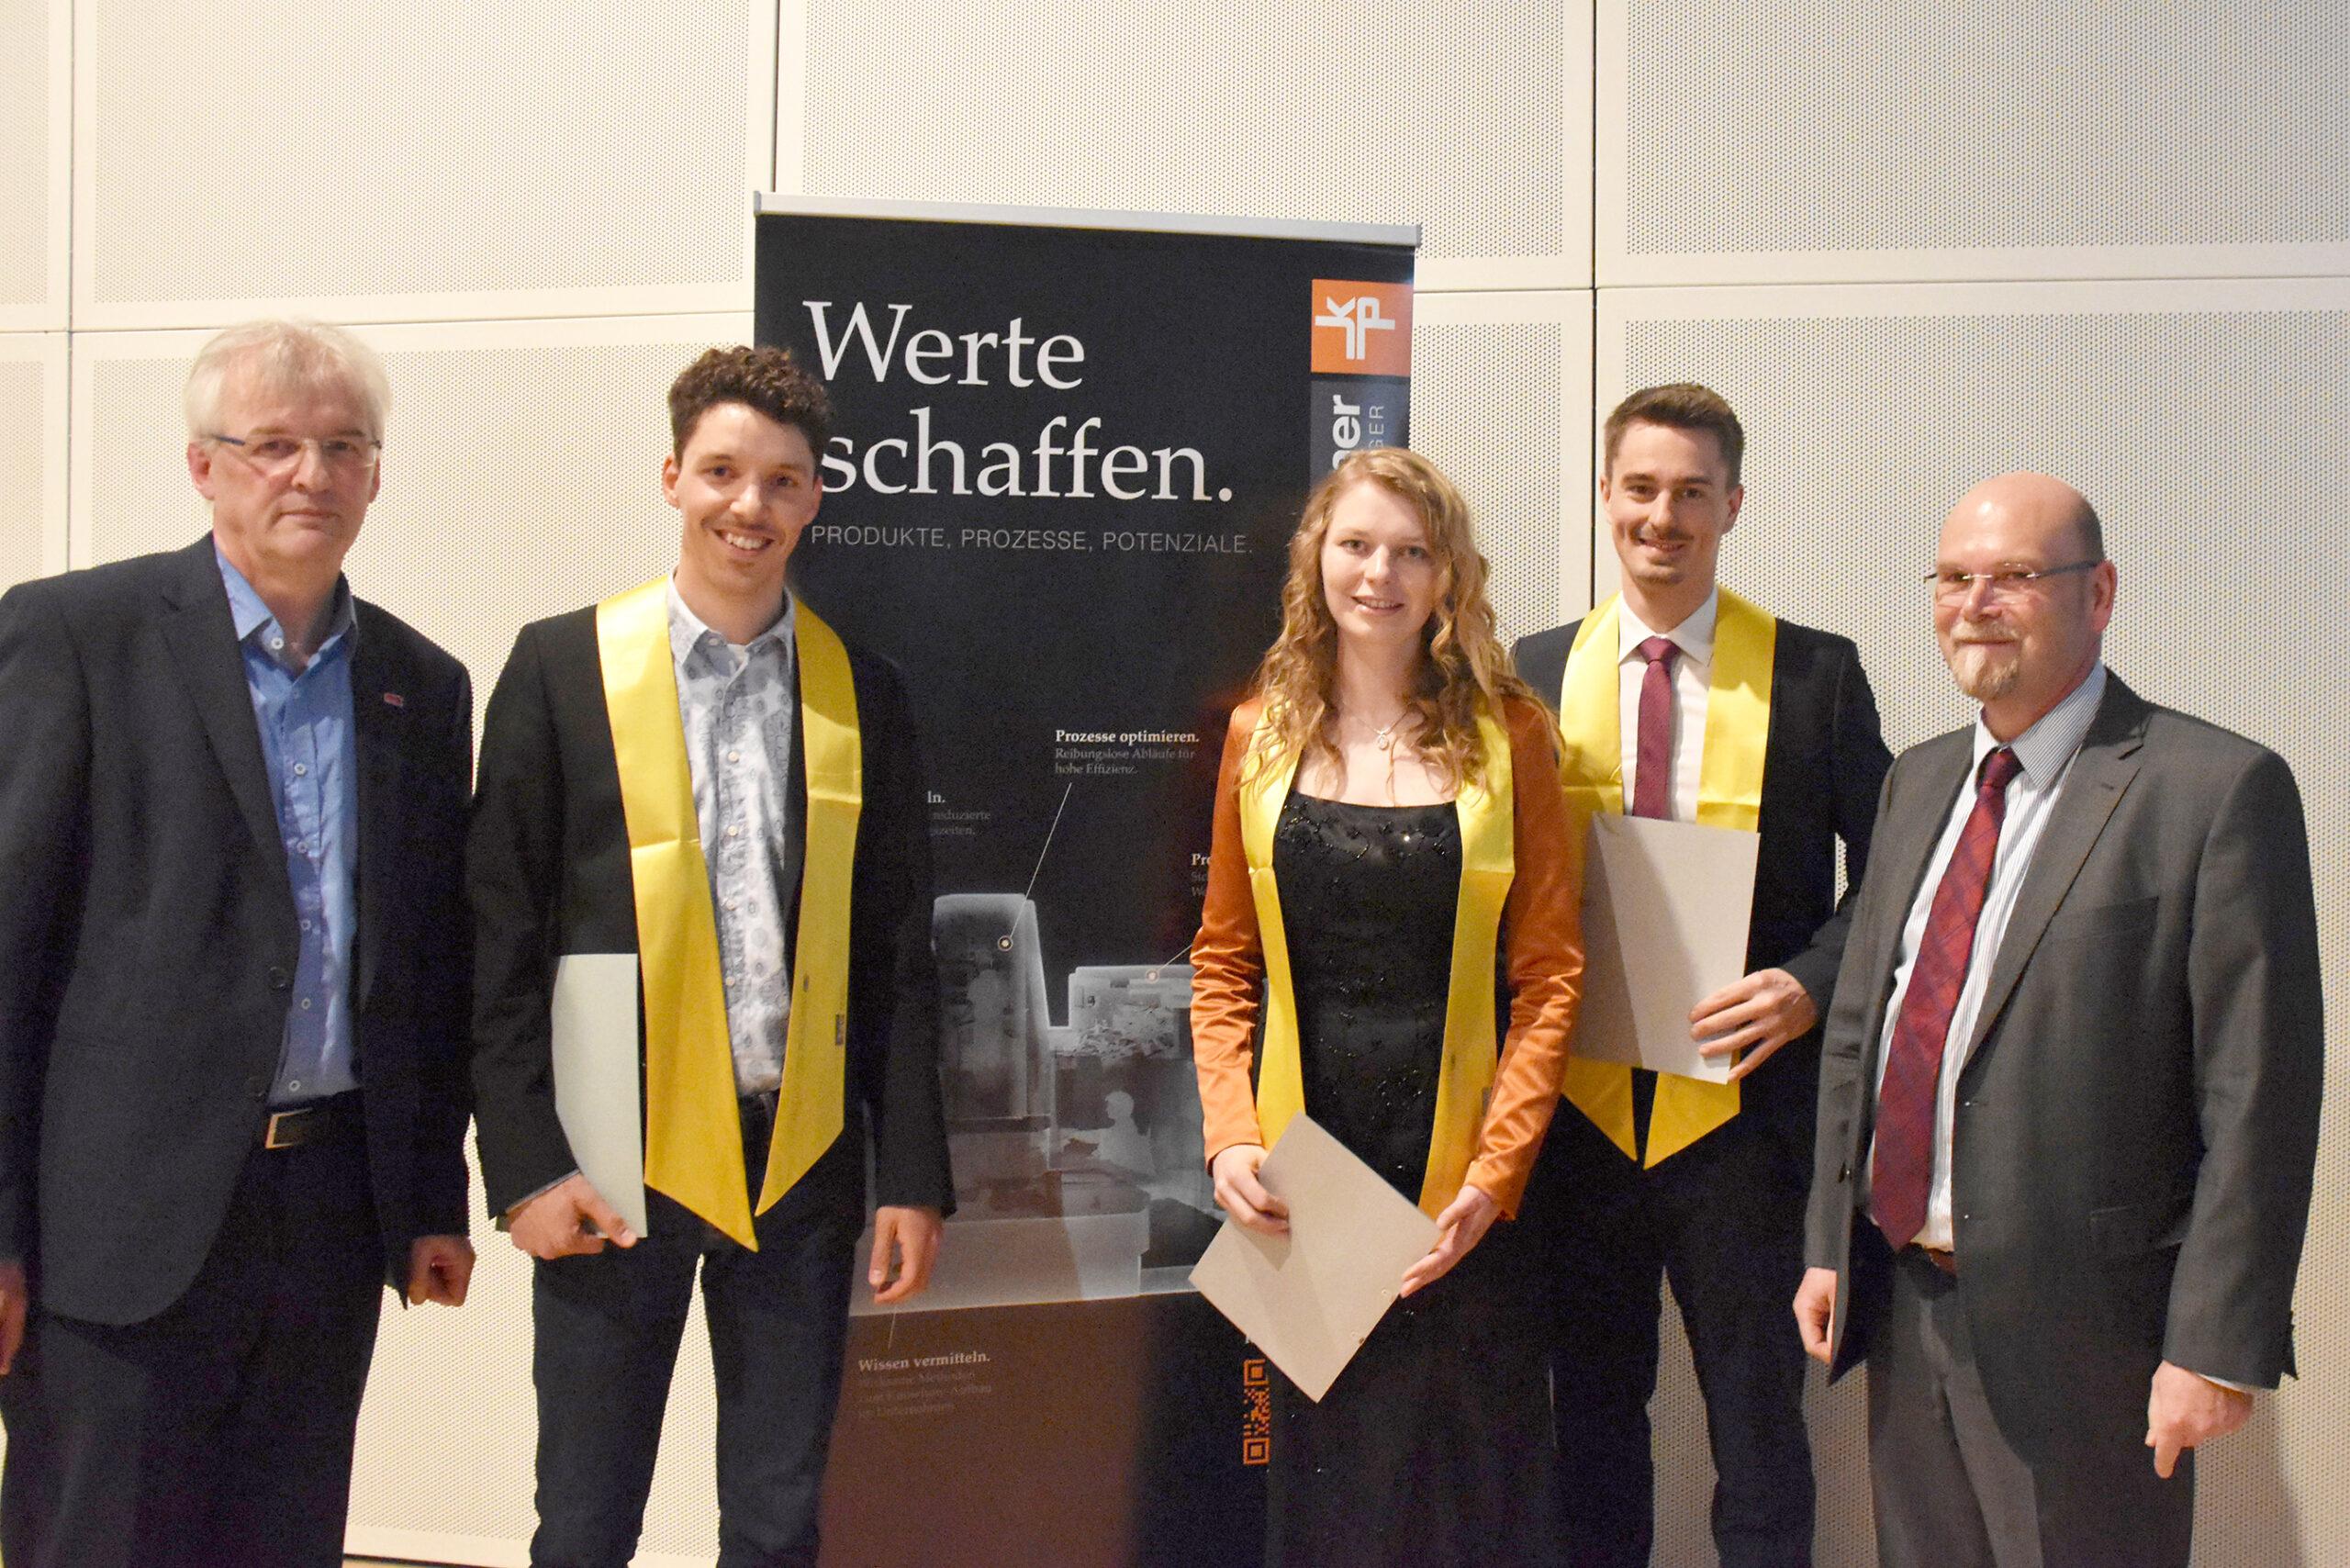 Preisträger-Krehl-und-Partner-Studienpreis